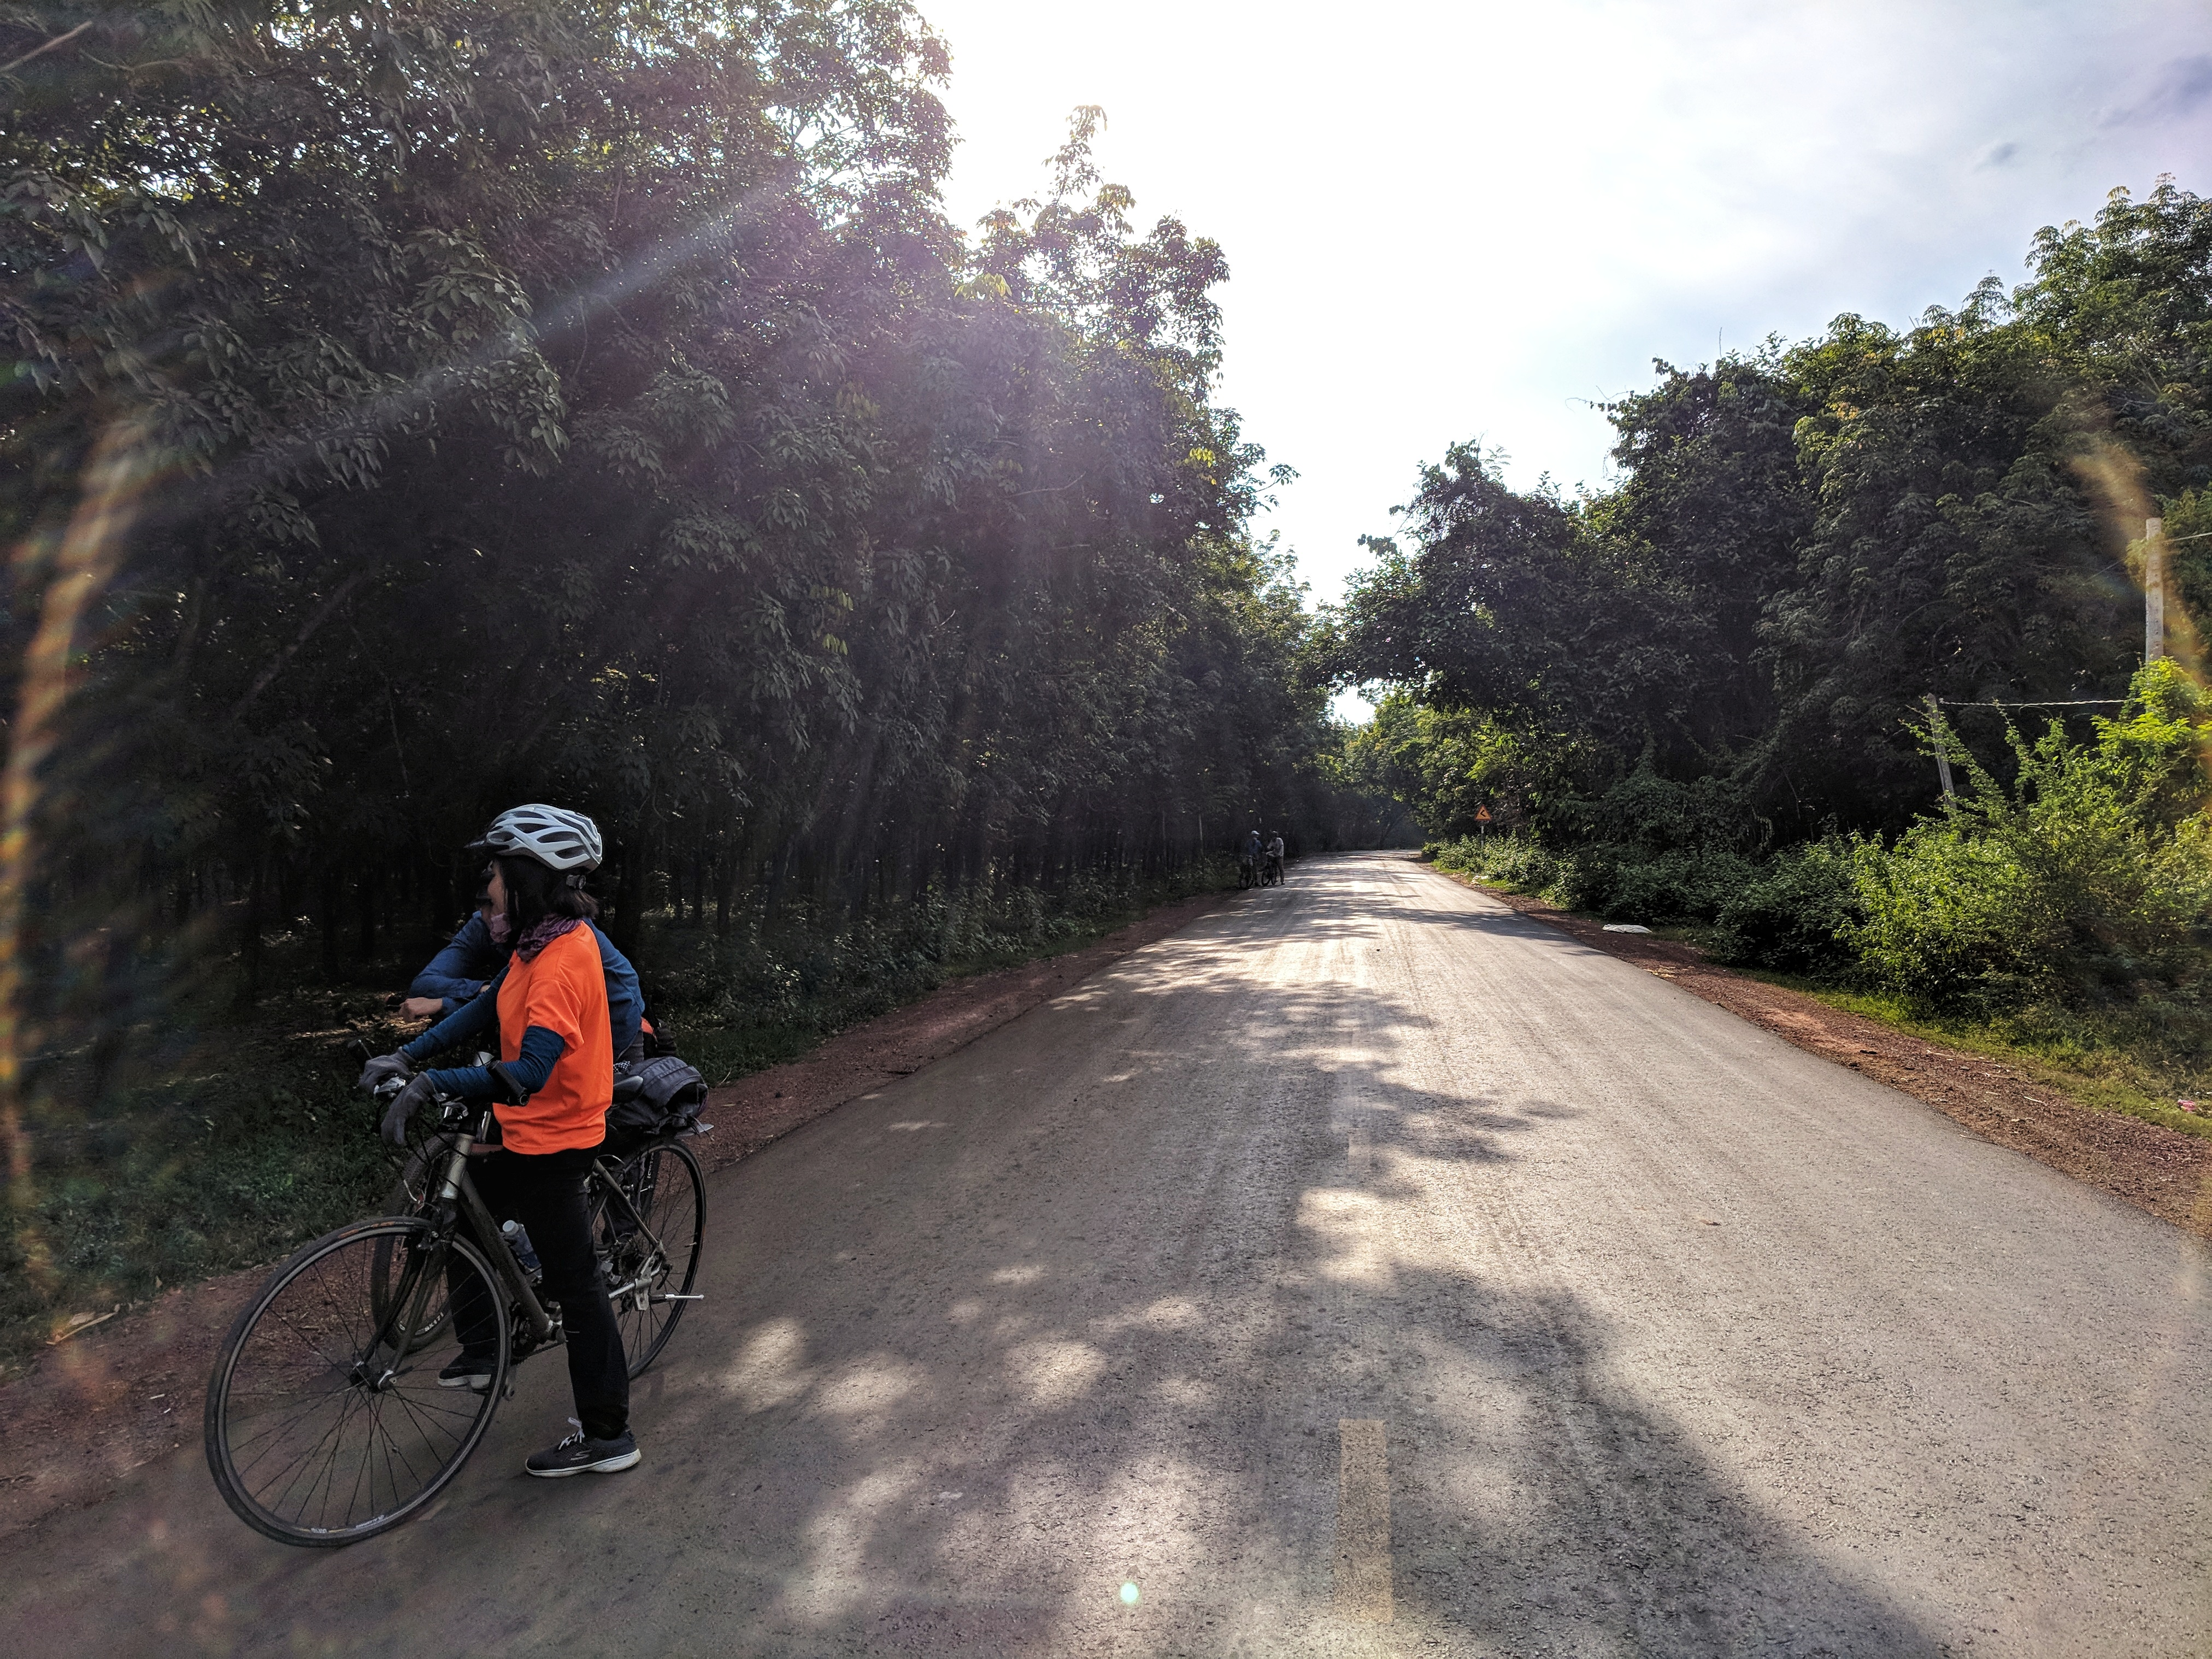 Tay Ninh Bike Route, Vietnam